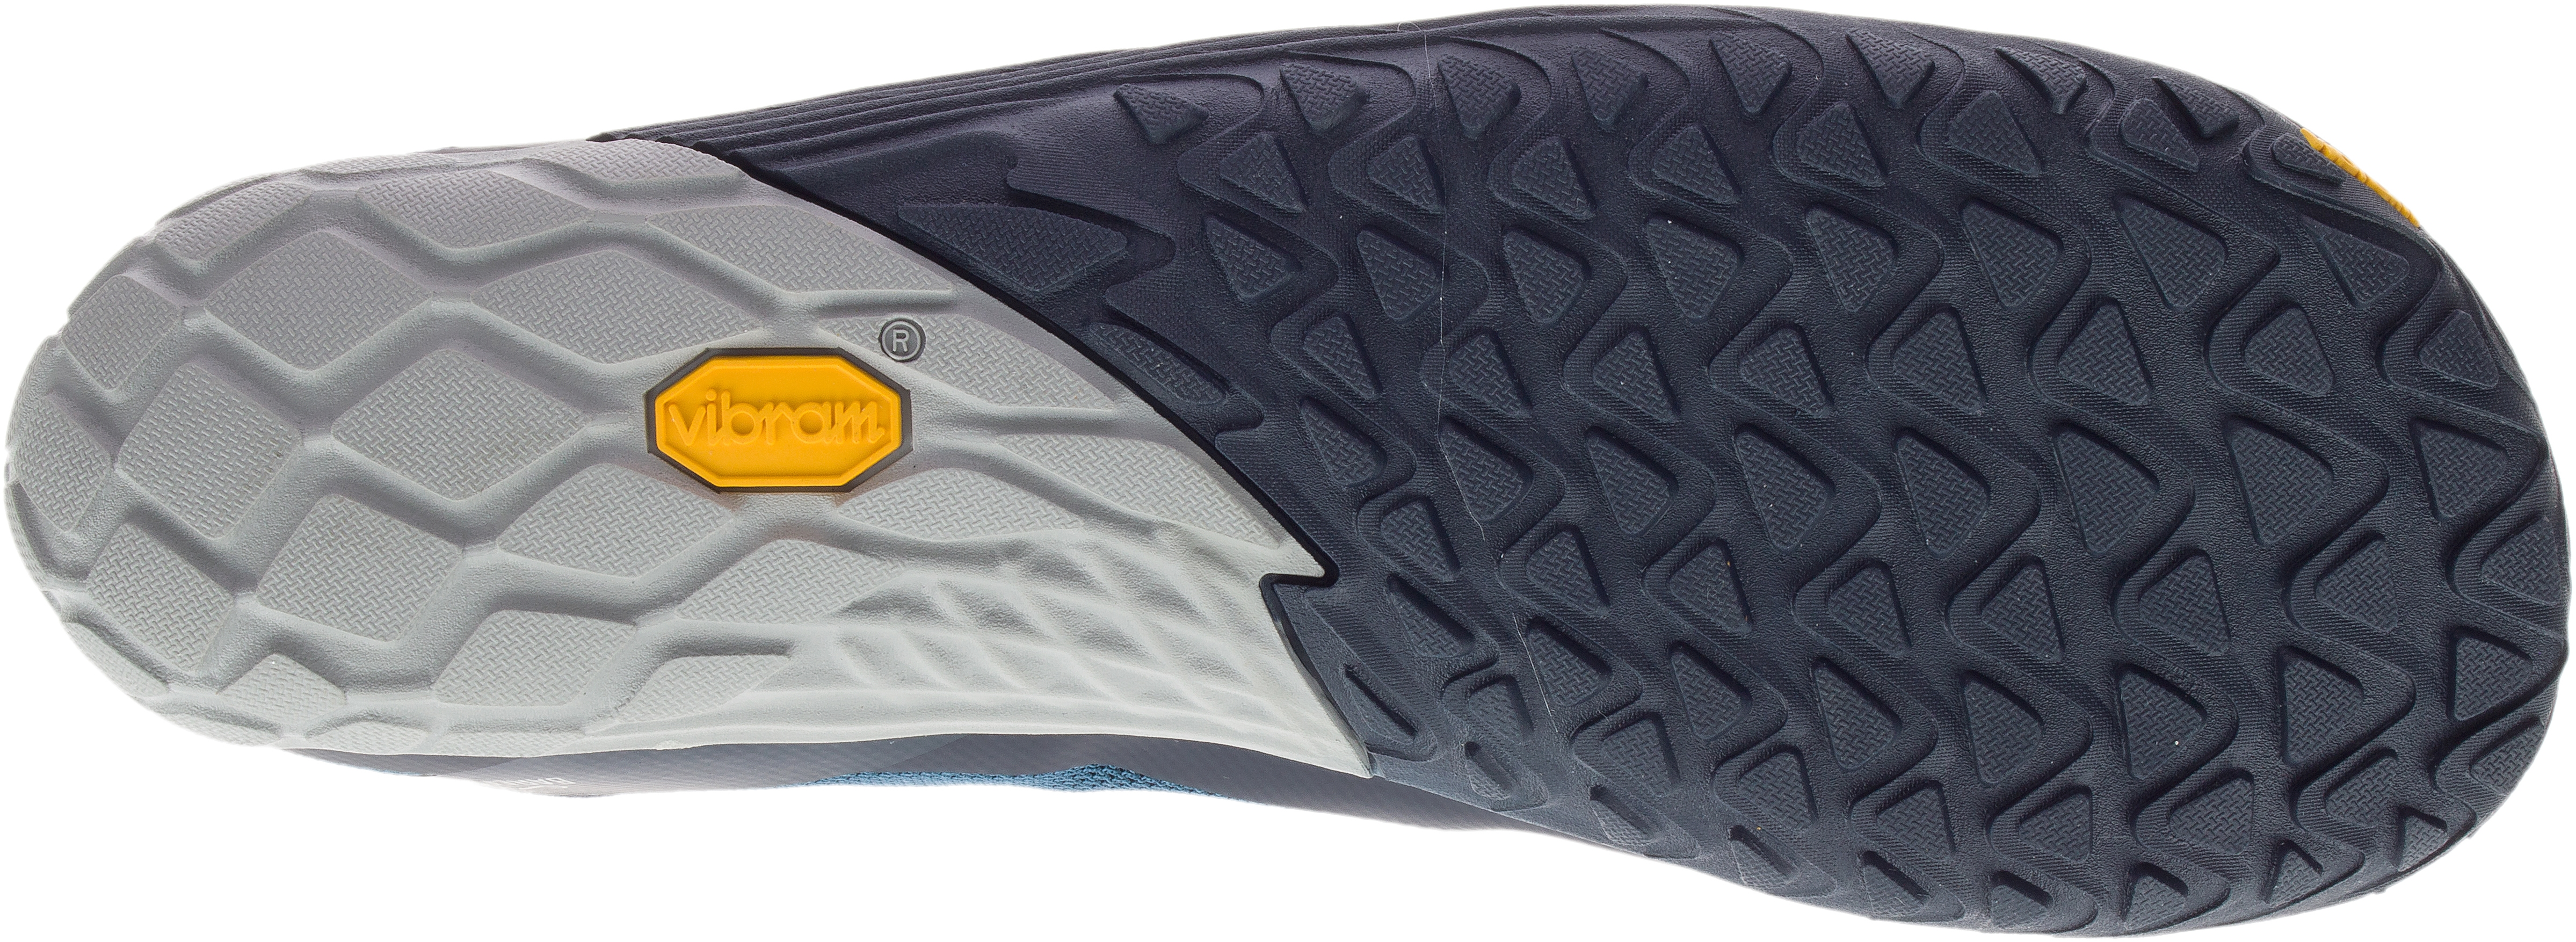 Vapor Glove 4, Polar